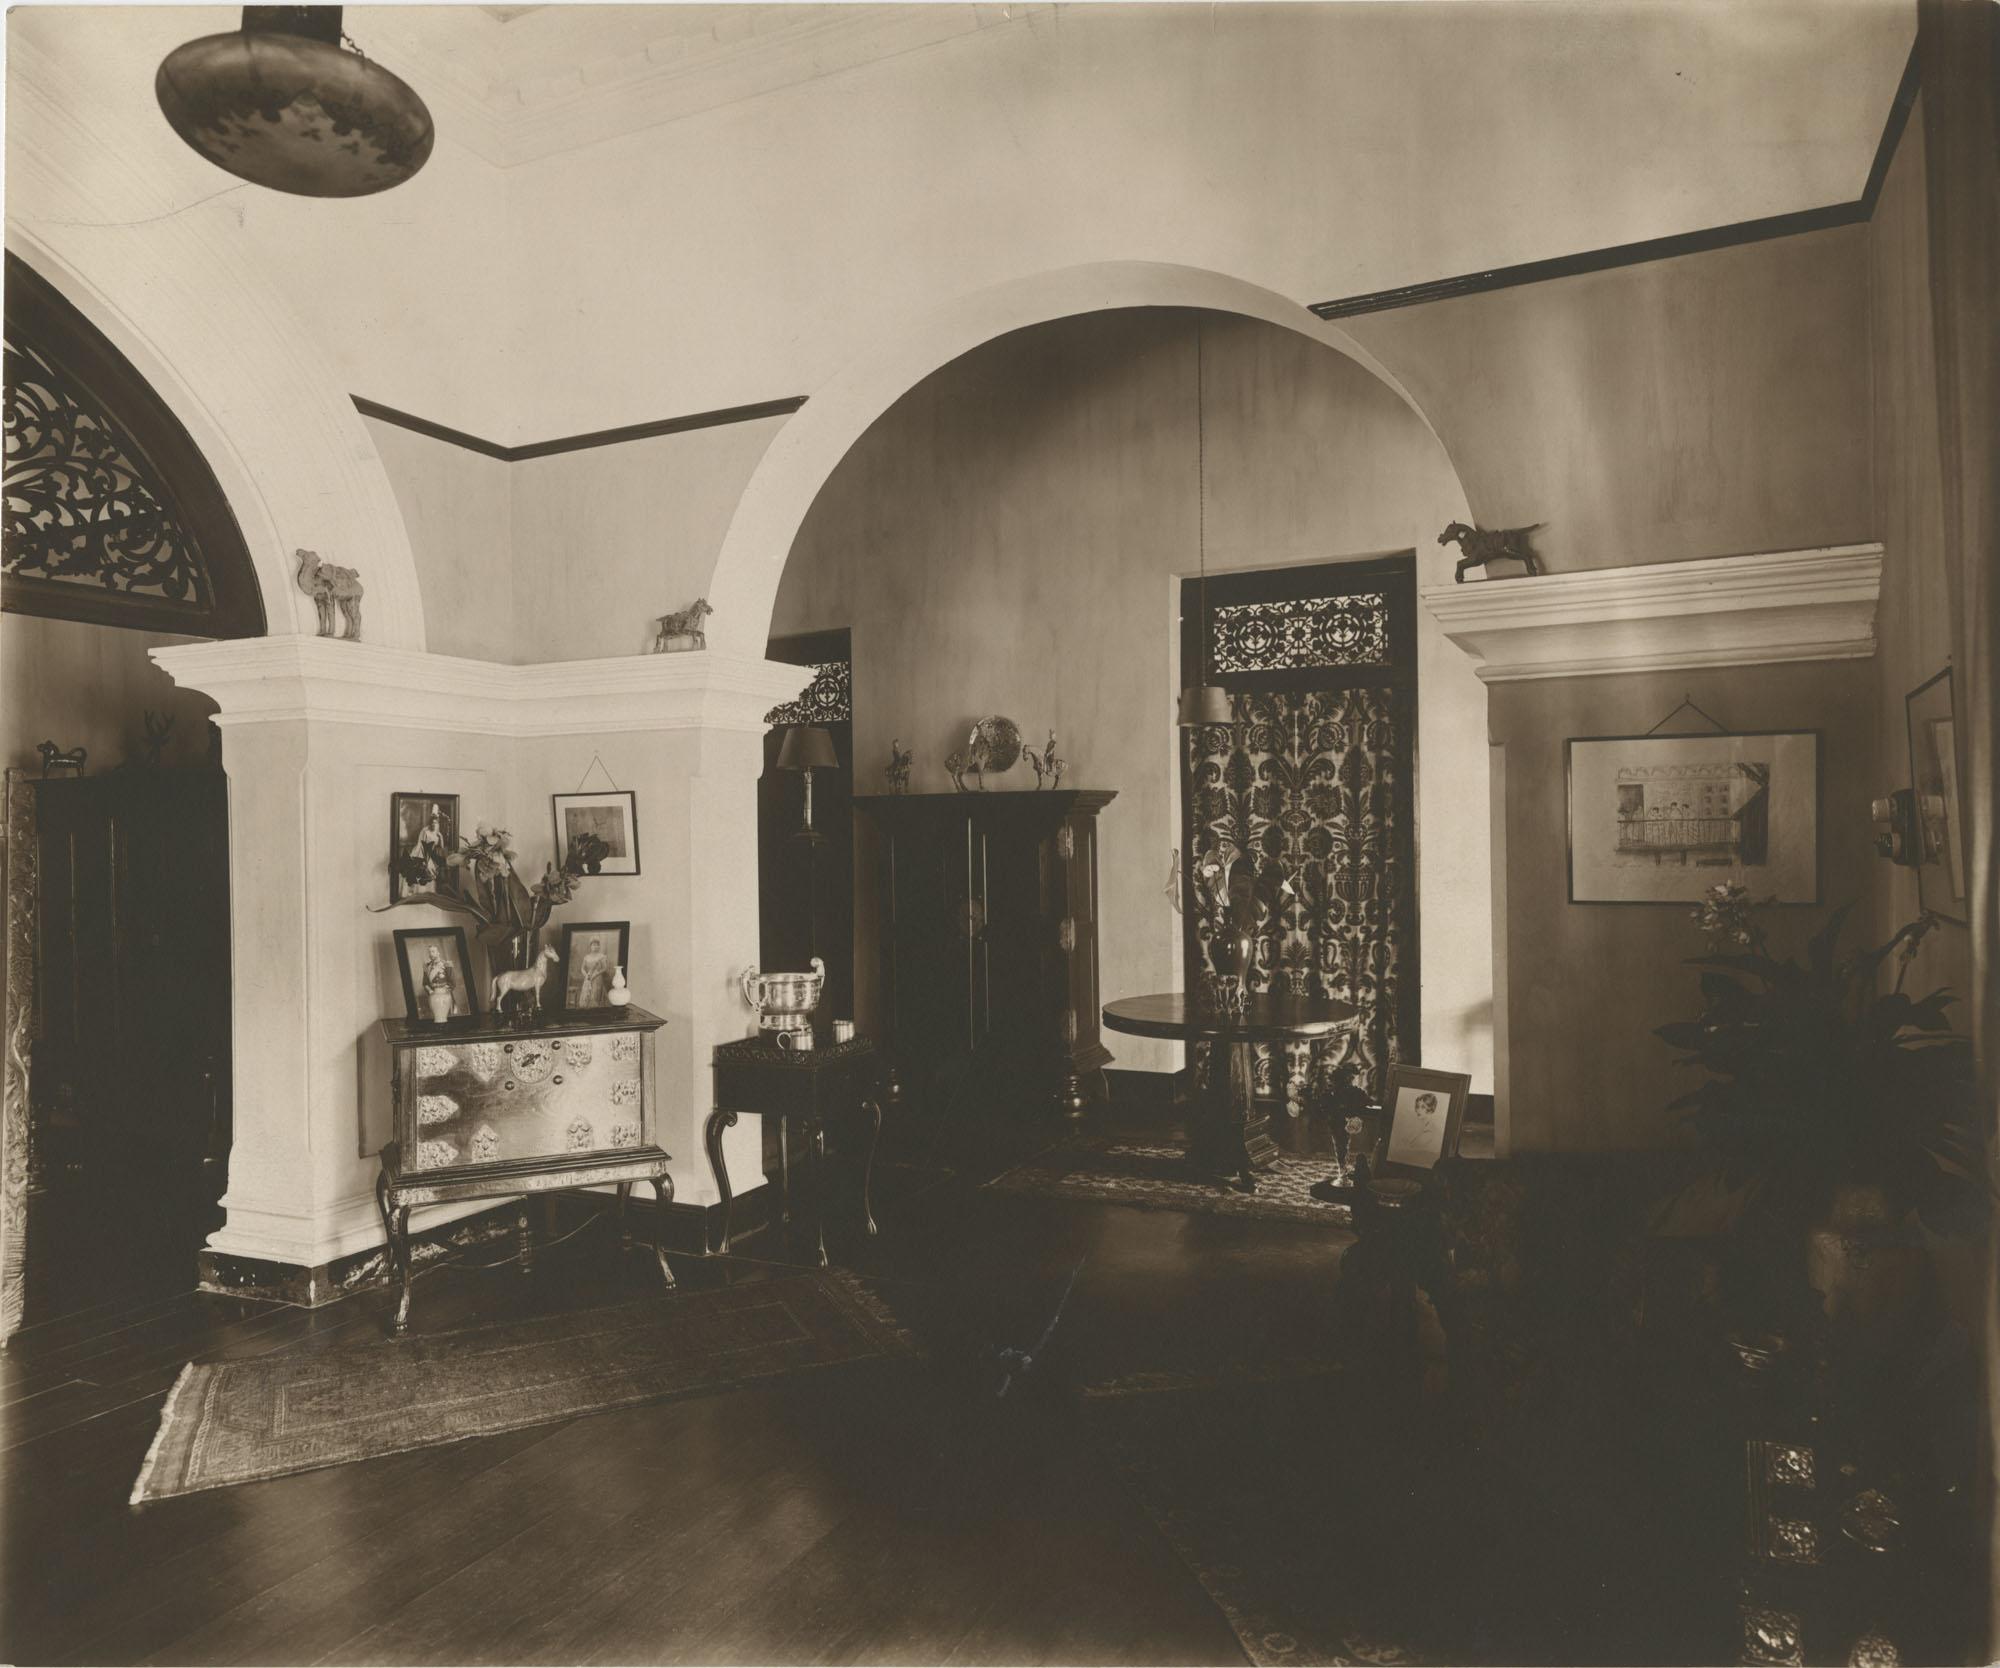 Interior of the Royal Italian Consul in Sri Lanka, Photograph 3